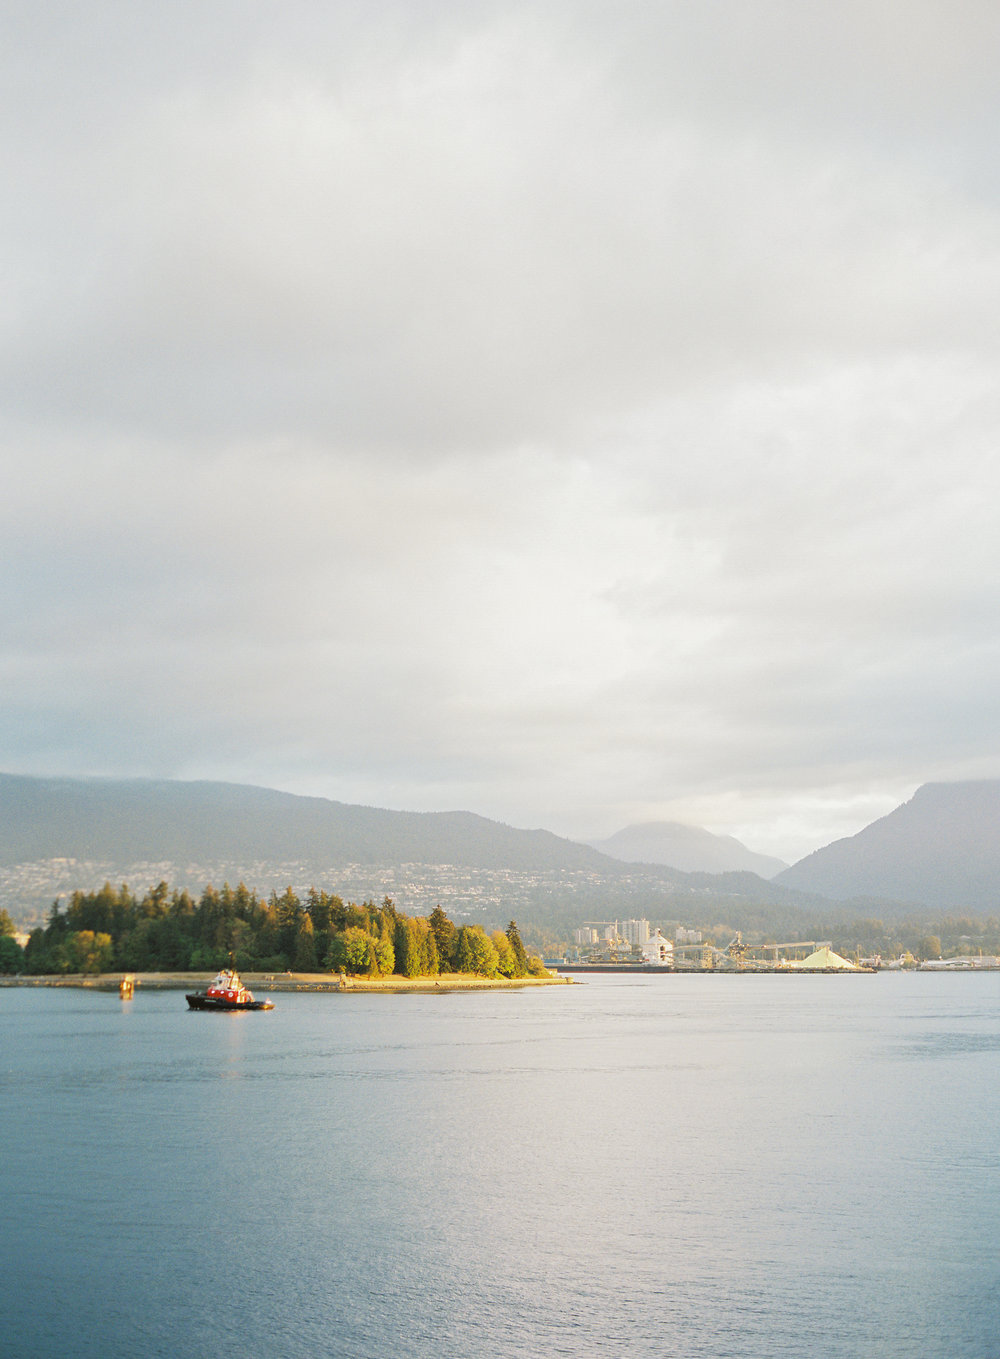 Alaska-Cruise-290-Jen_Huang-005435-R1-003.jpg